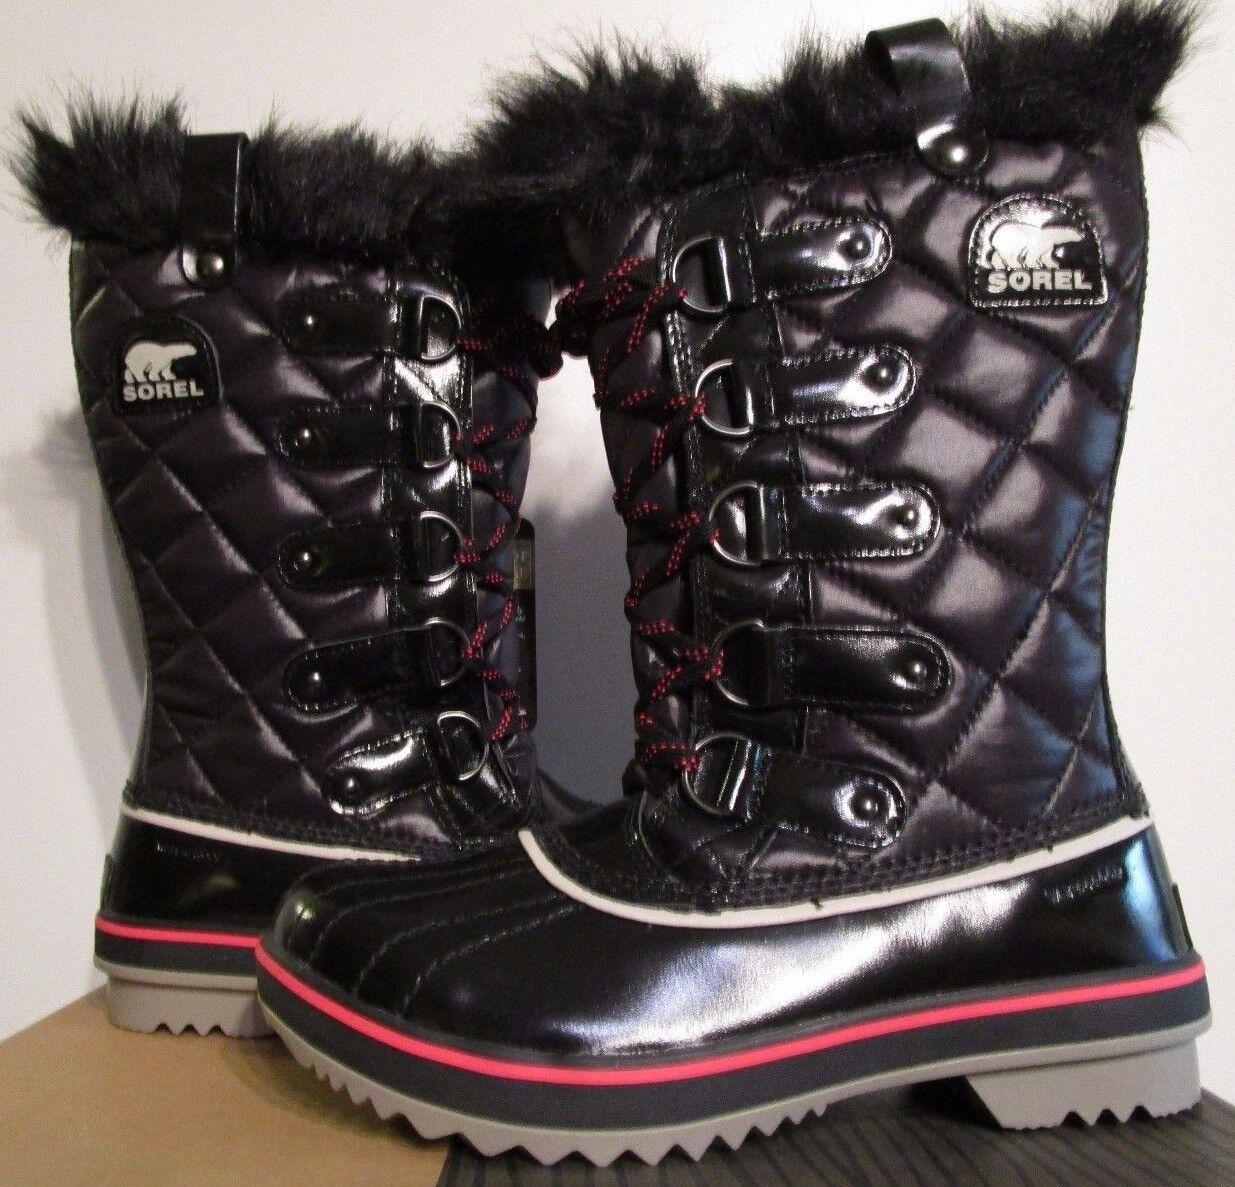 Damenschuhe 7-7.5-8-8.5-9-10 Sorel Tofino Nylon Waterpoof Insulated Warm Snow Stiefel